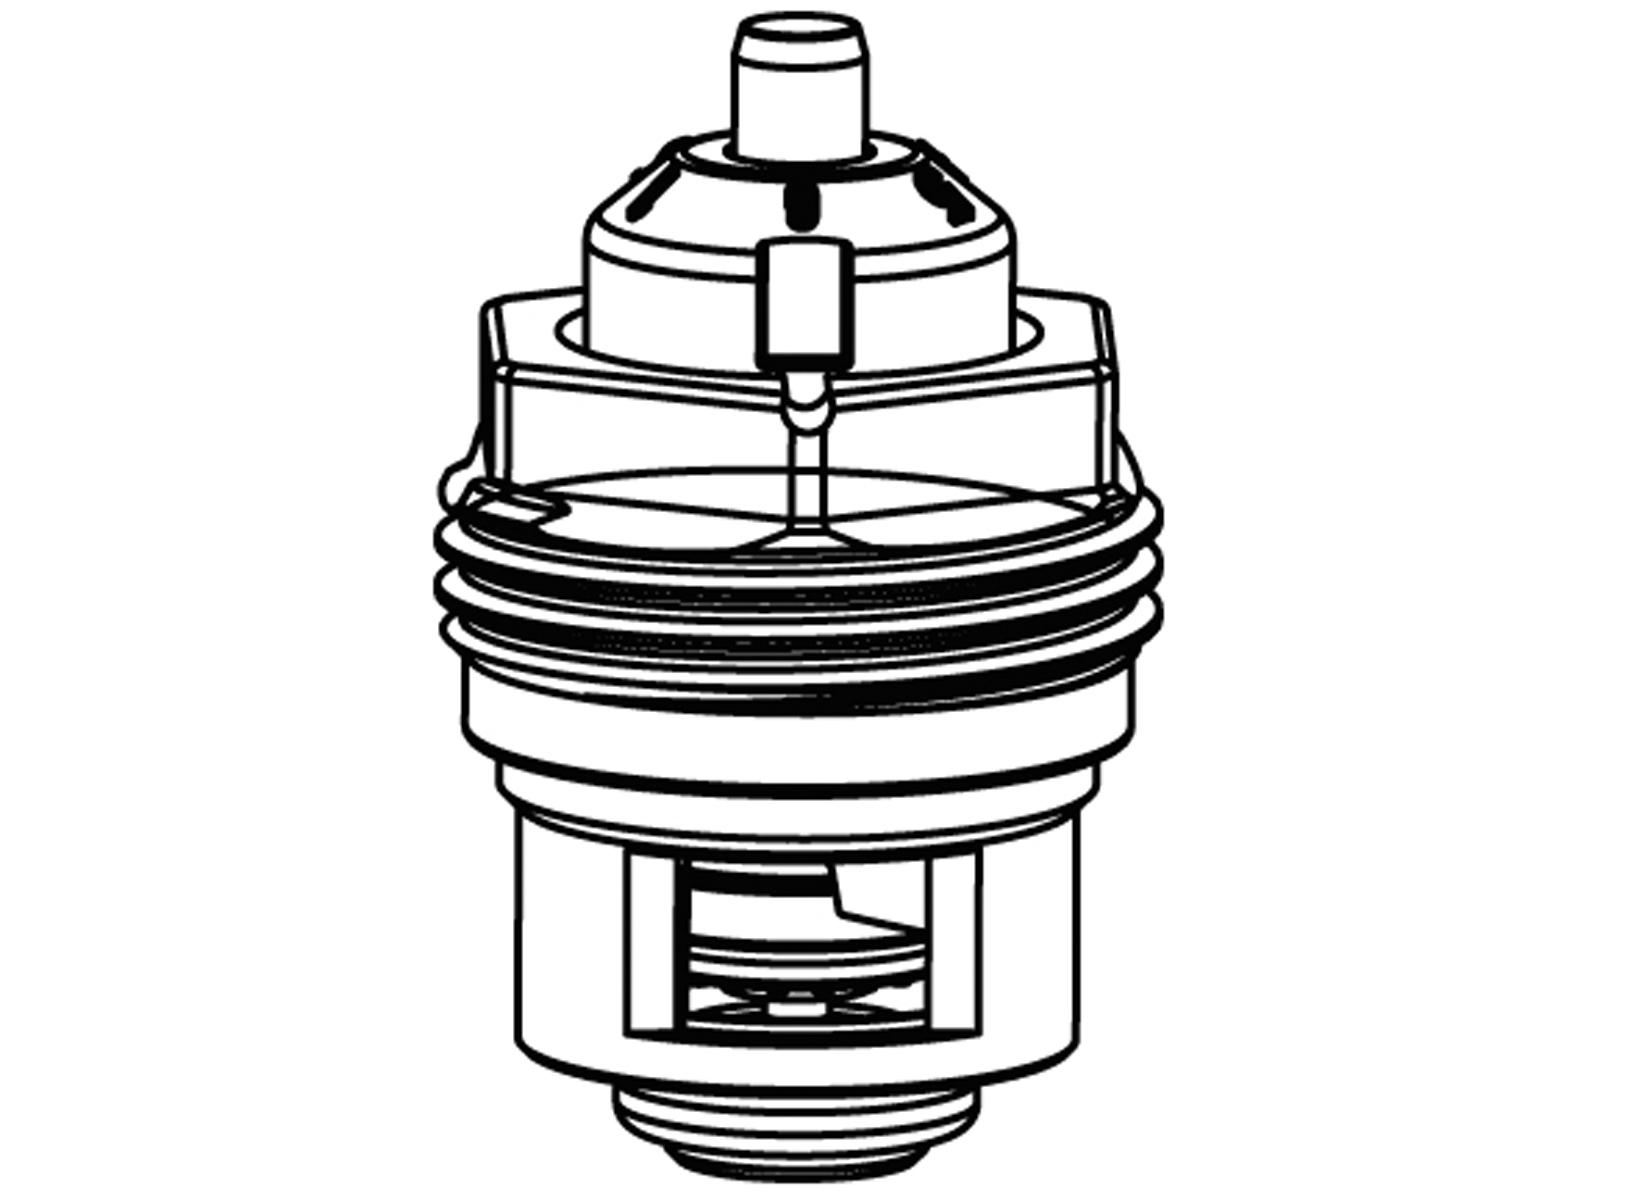 heimeier thermostatventil oberteil v exakt ii 3 8 1 2 3 4 ventileinsatz bis 2011 ebay. Black Bedroom Furniture Sets. Home Design Ideas